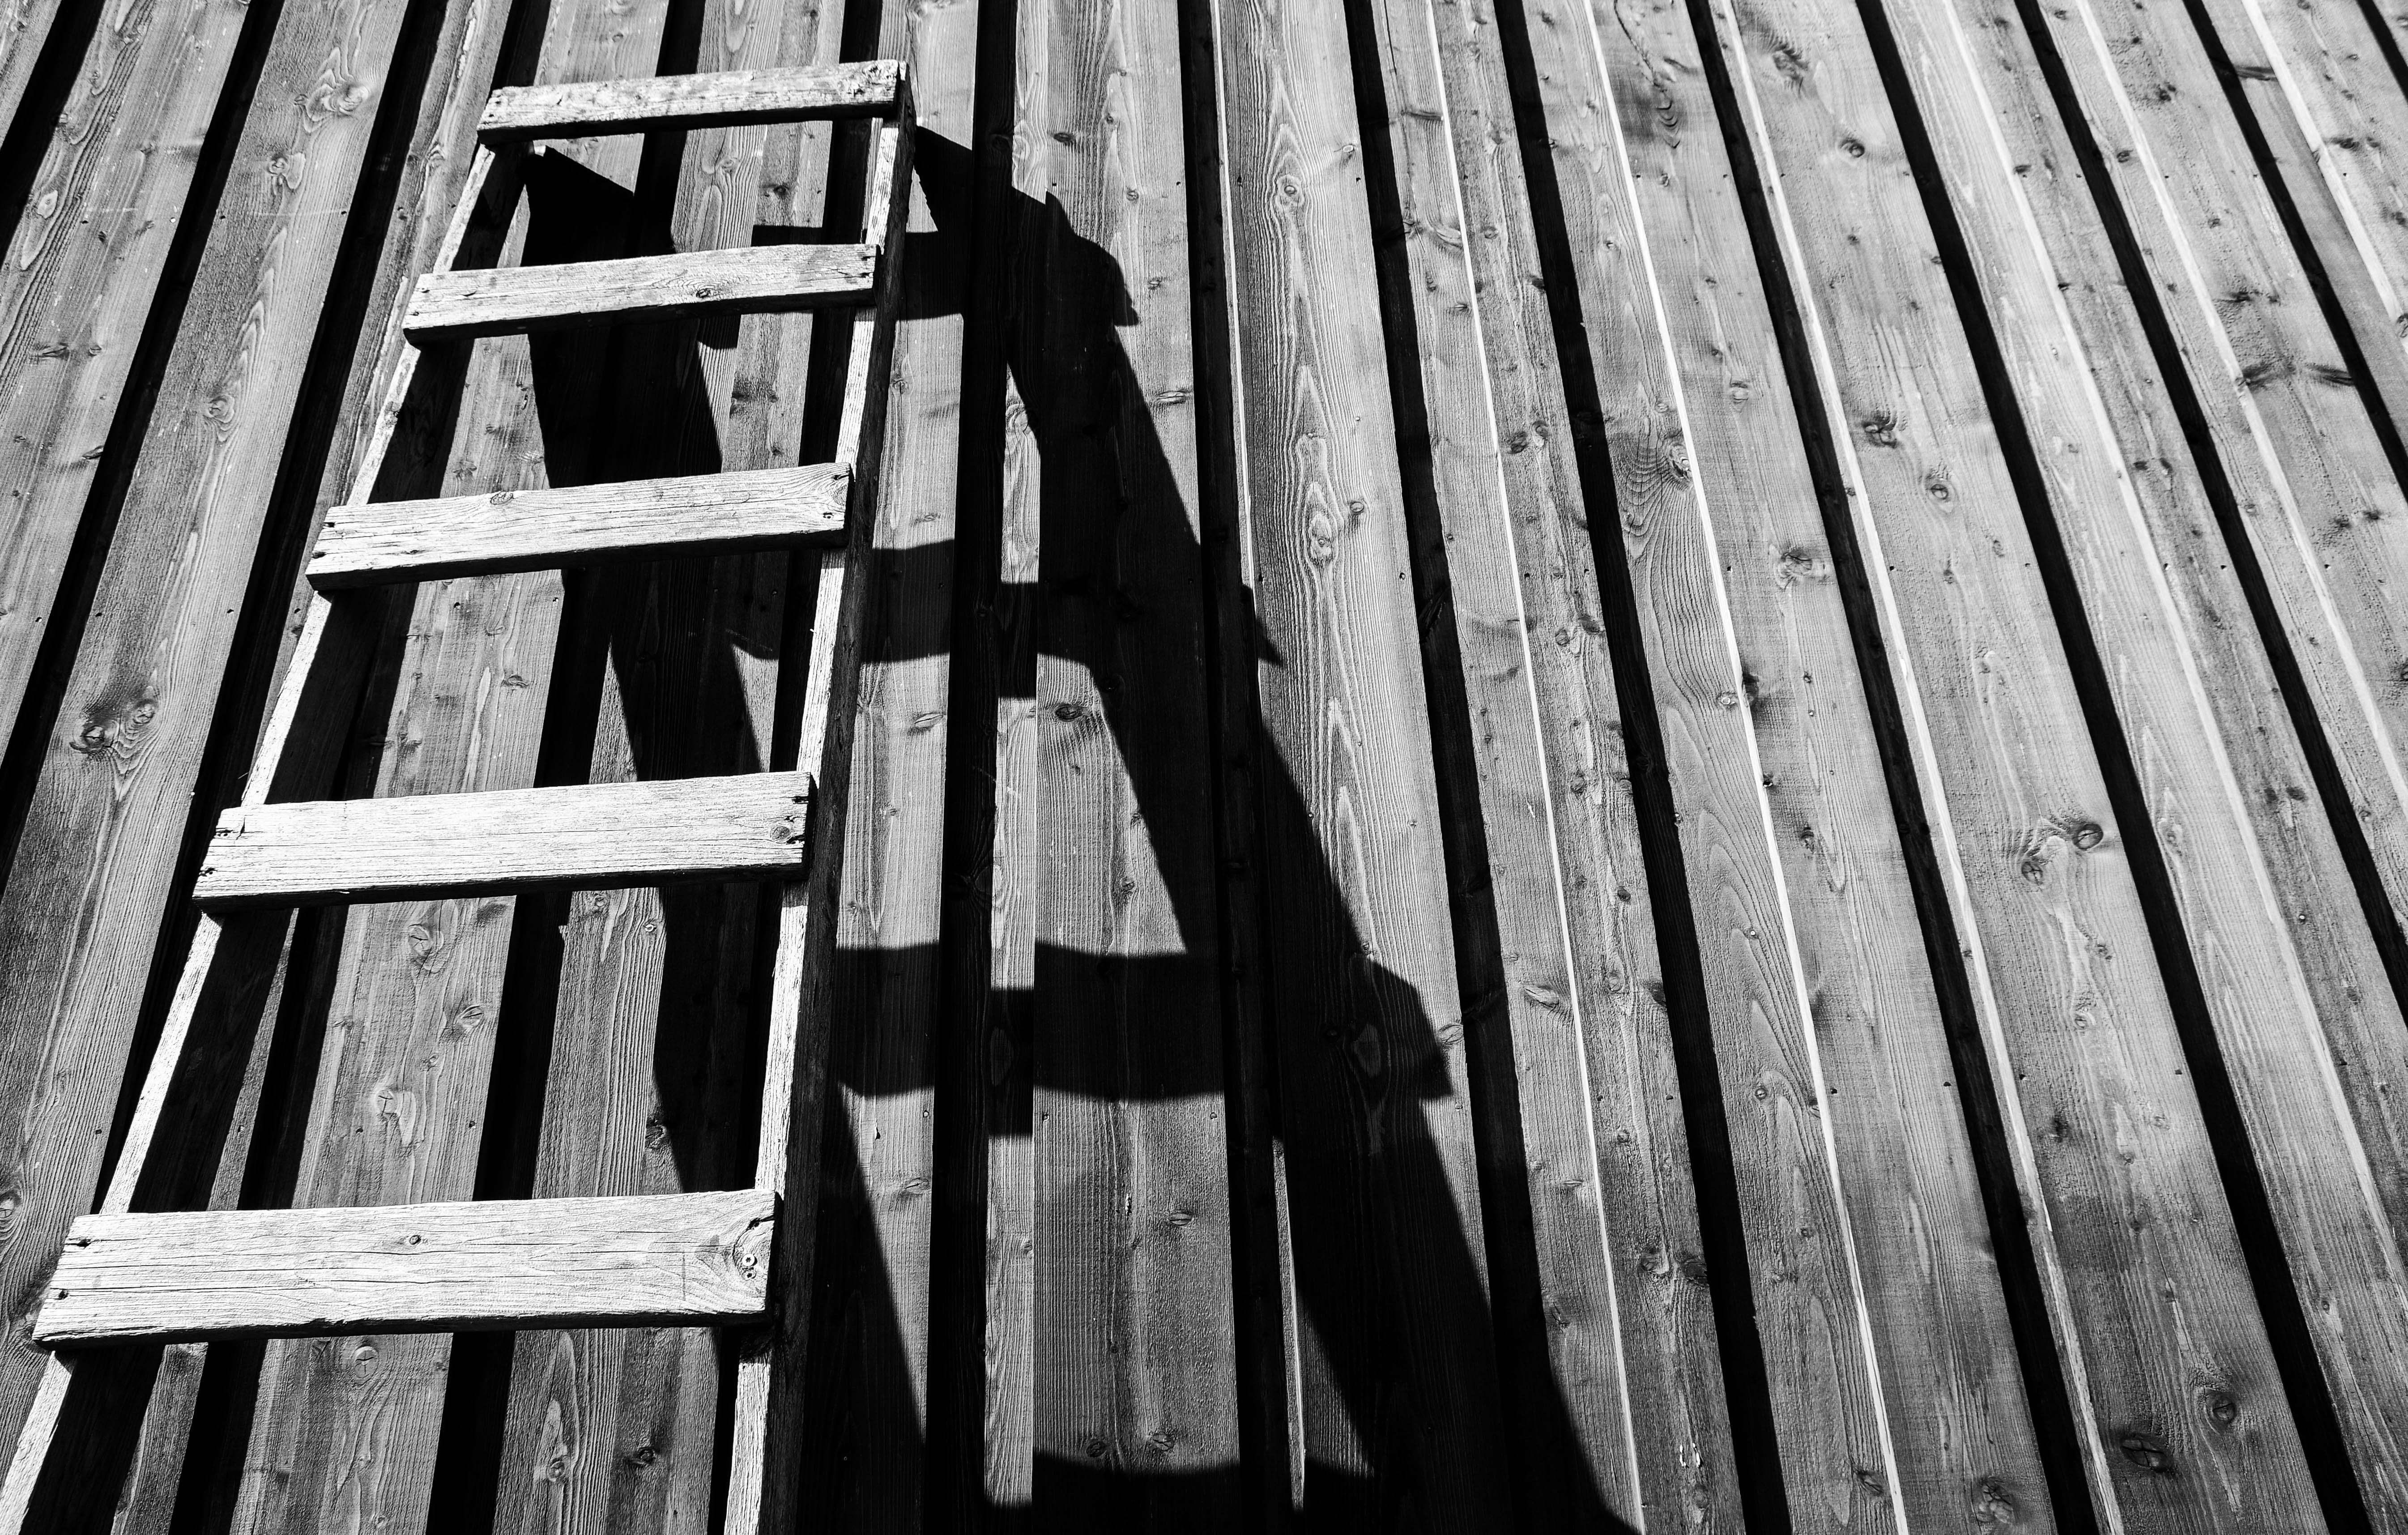 Gray Wooden Ladder